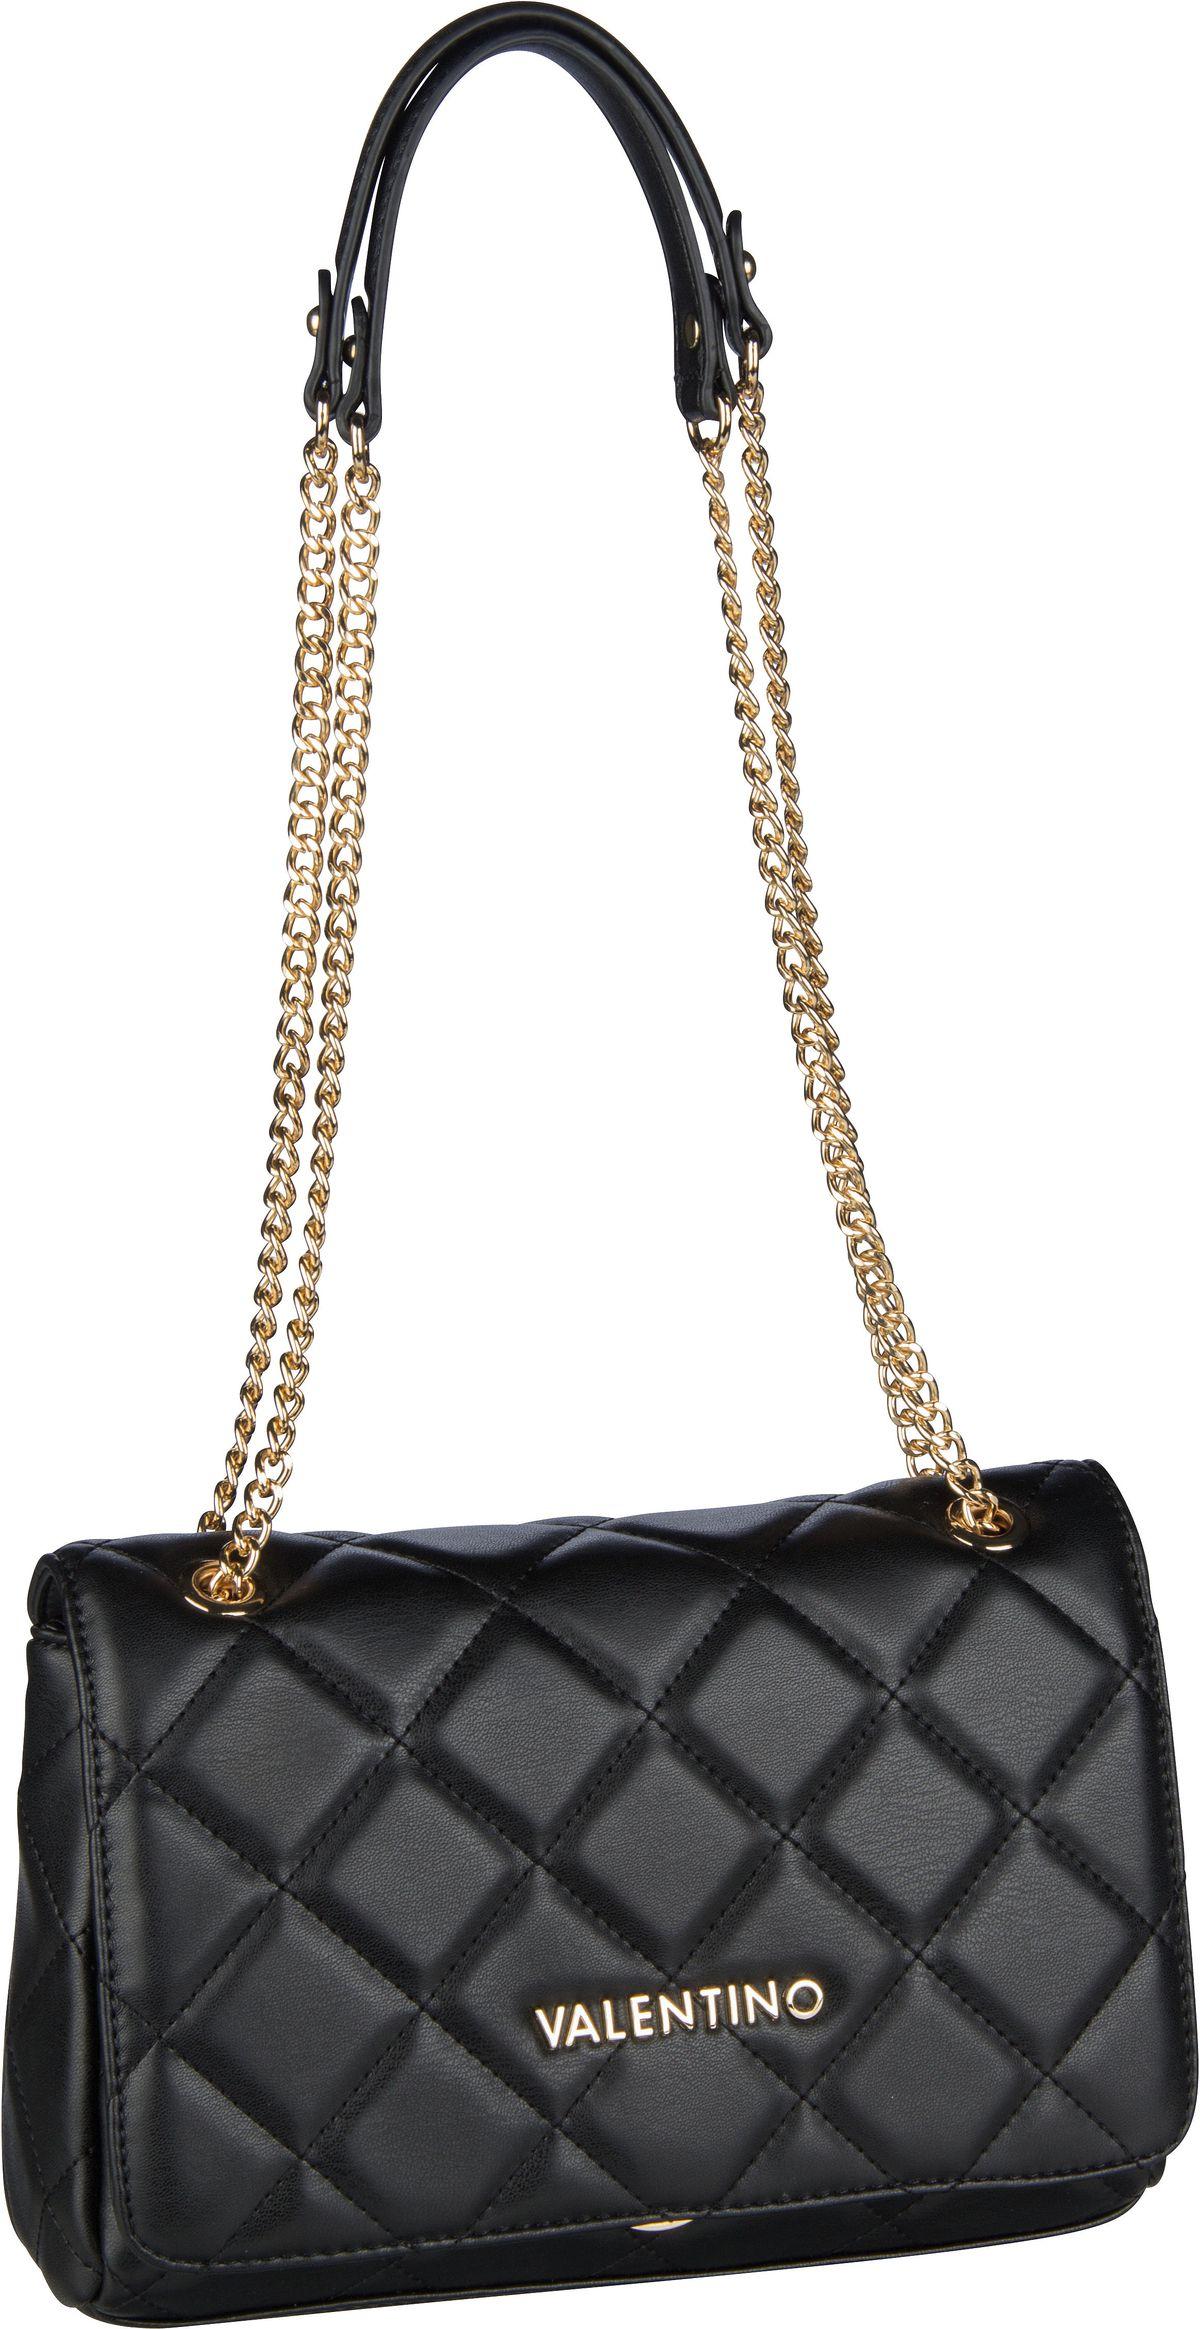 Bags Handtasche Ocarina Pattina K02 Nero